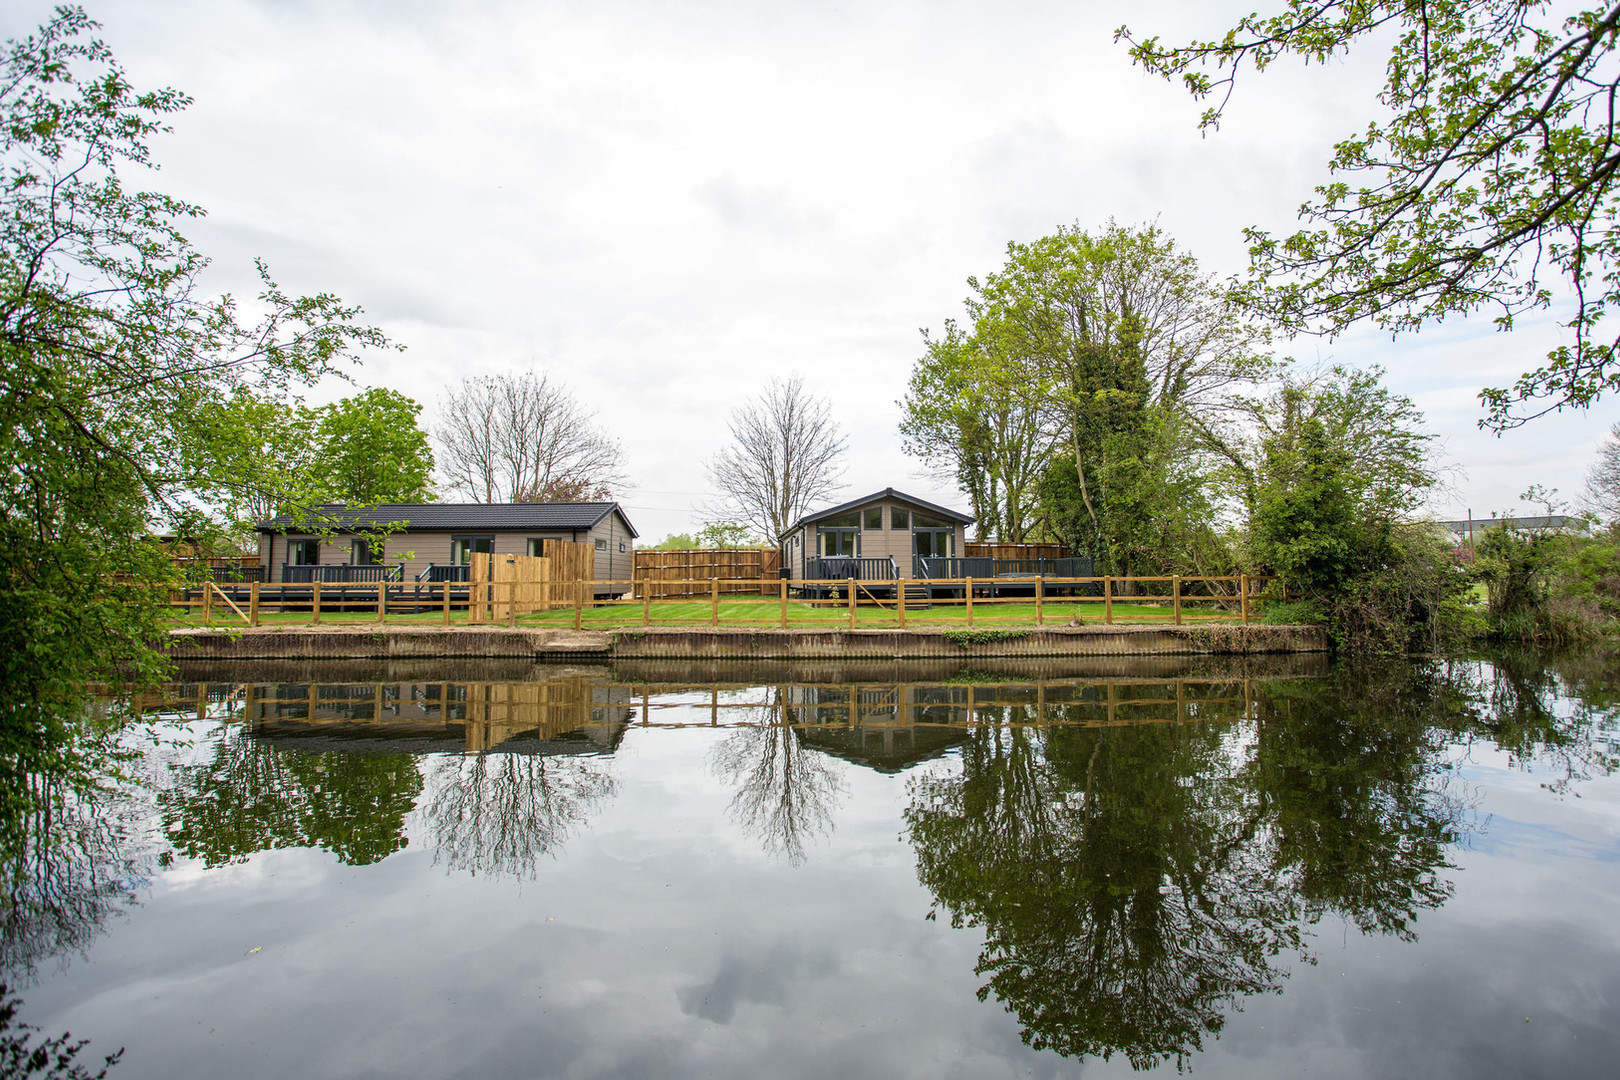 Luxury riverside lodges